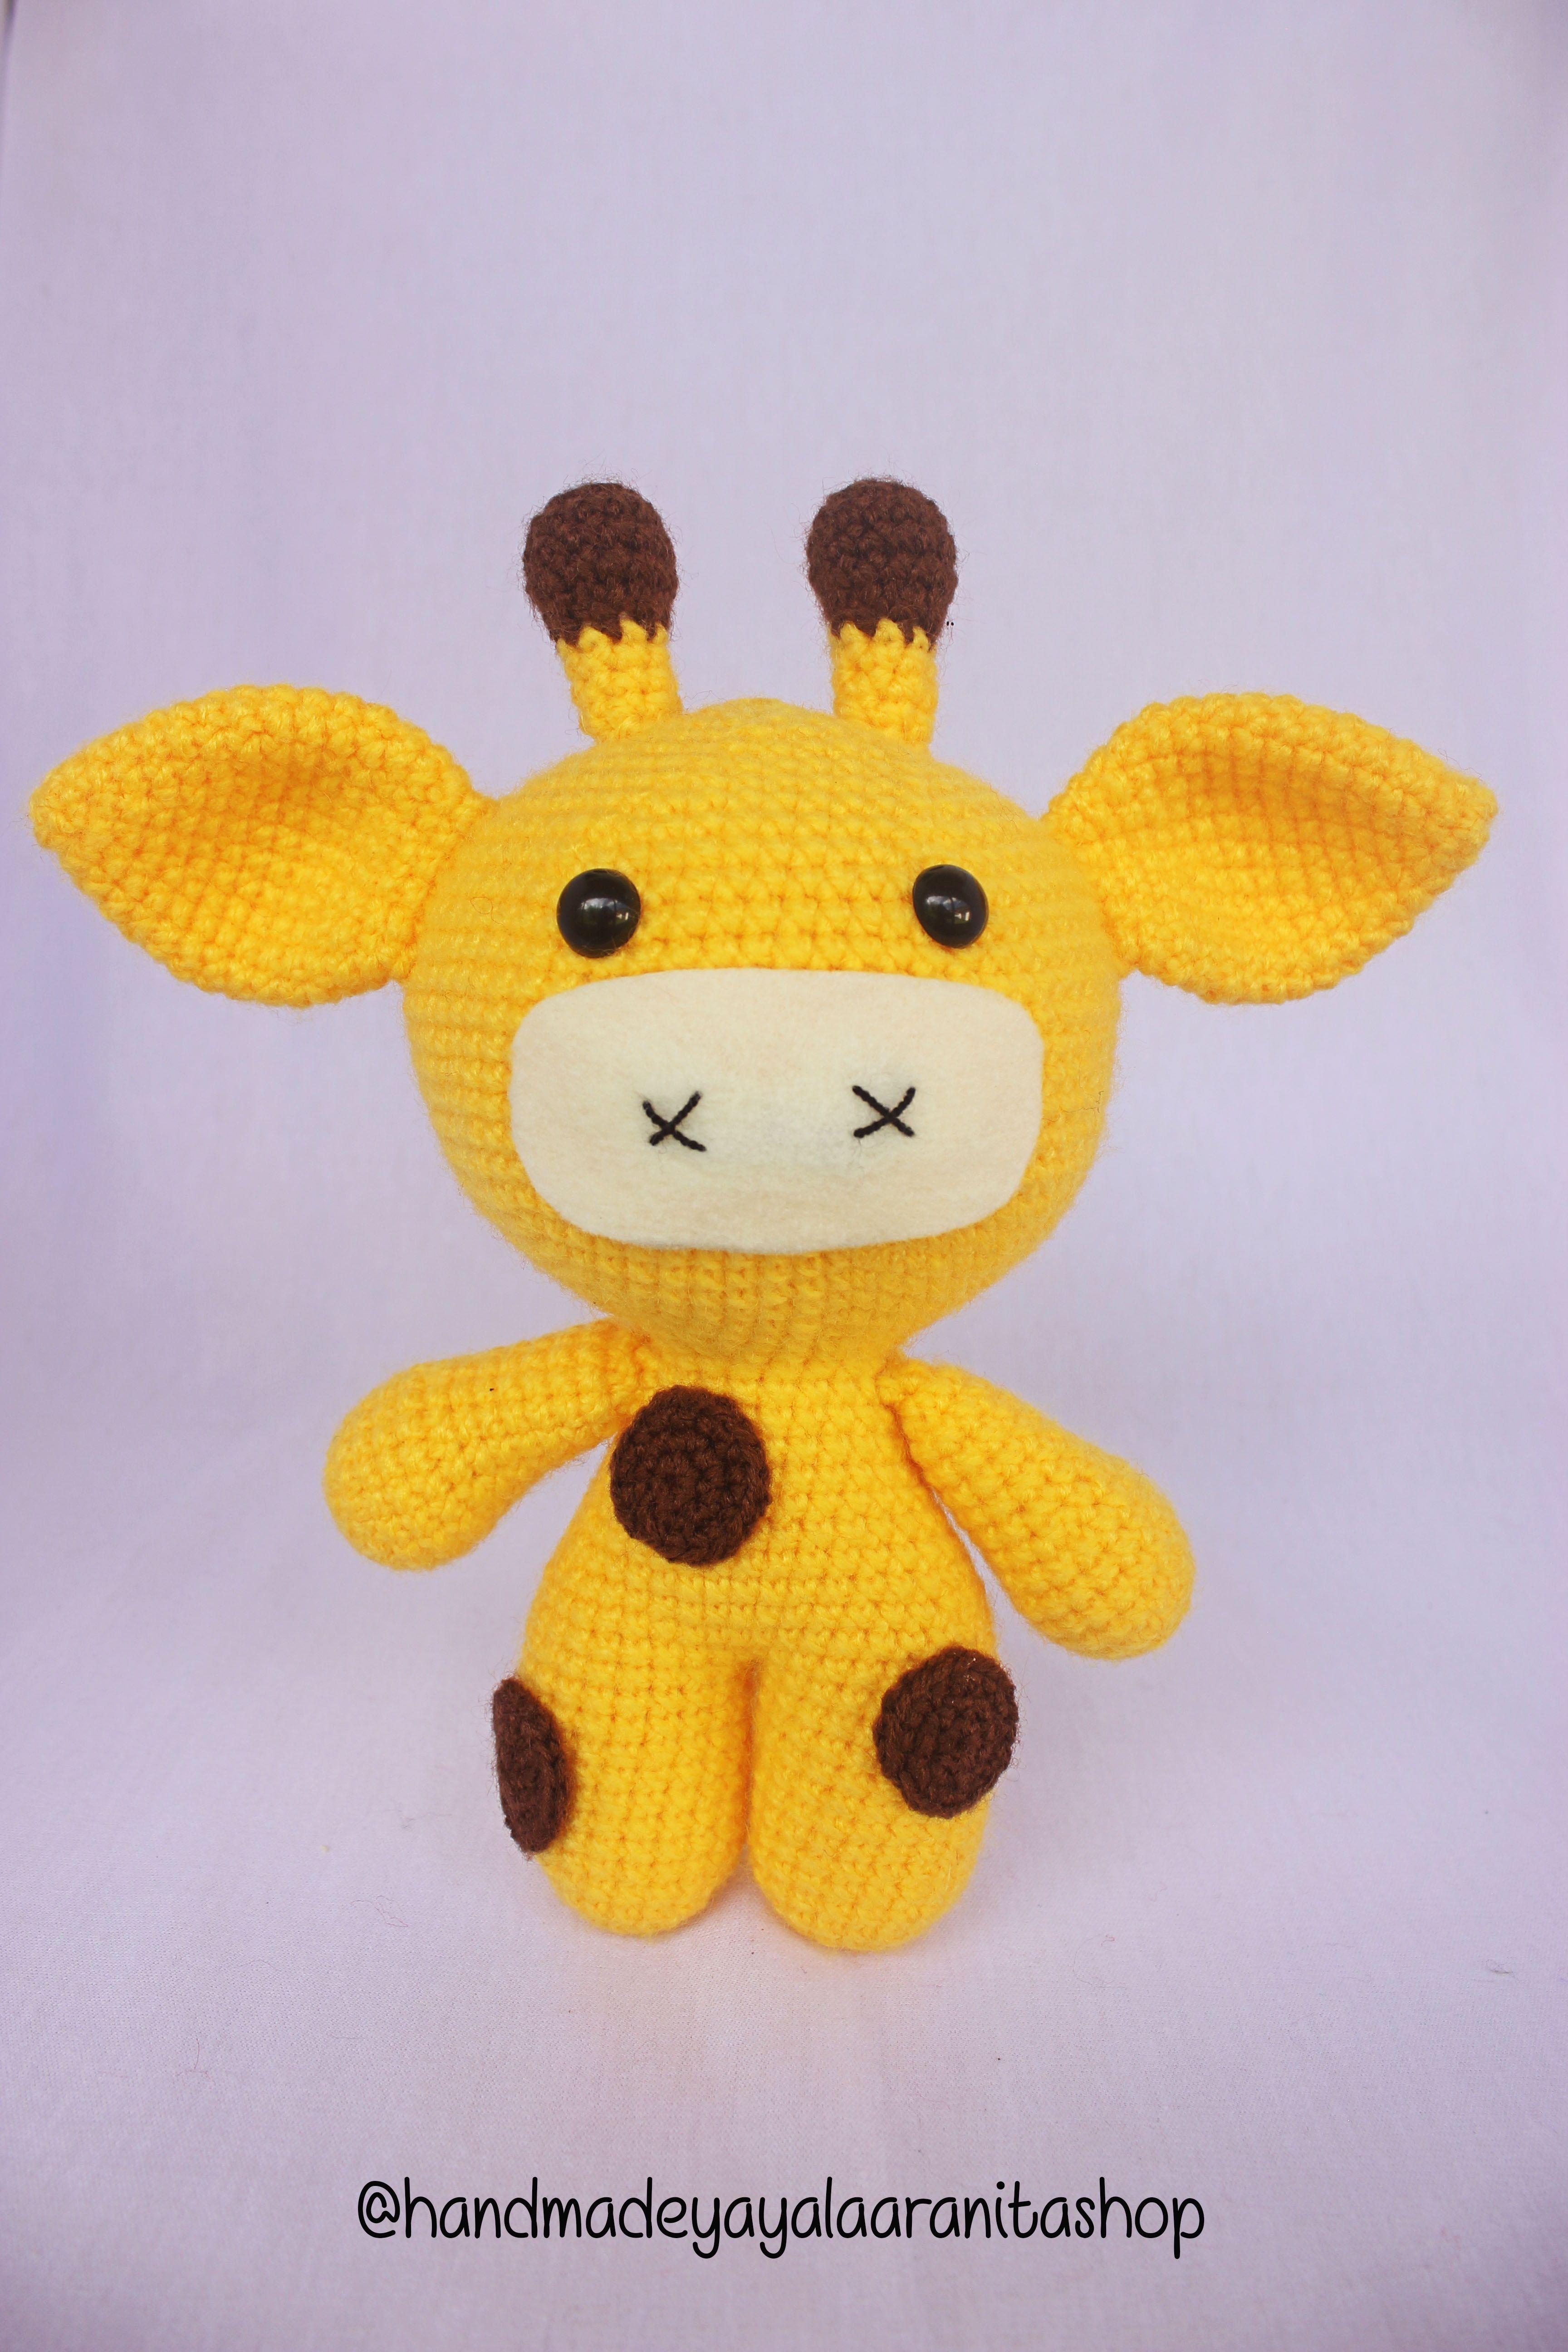 MIL ANUNCIOS.COM - Jirafa amigurumi tejida a mano crochet   5184x3456